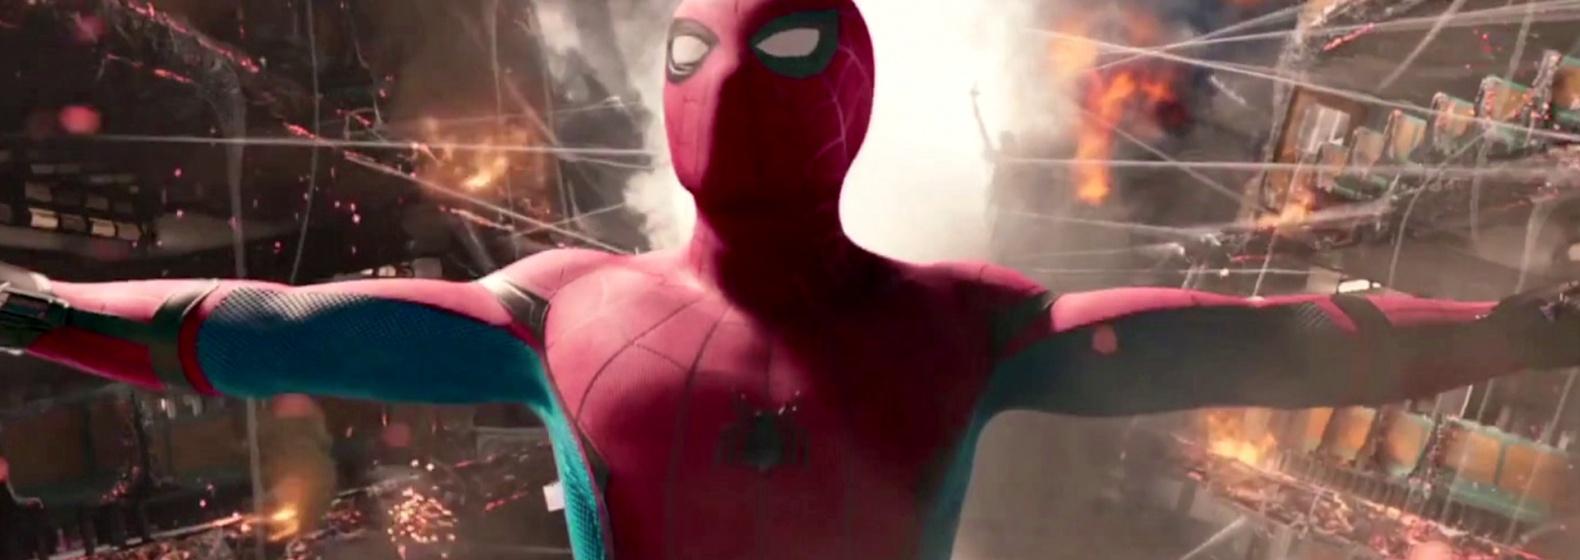 spiderman_homecoming_film_de_cas.jpg